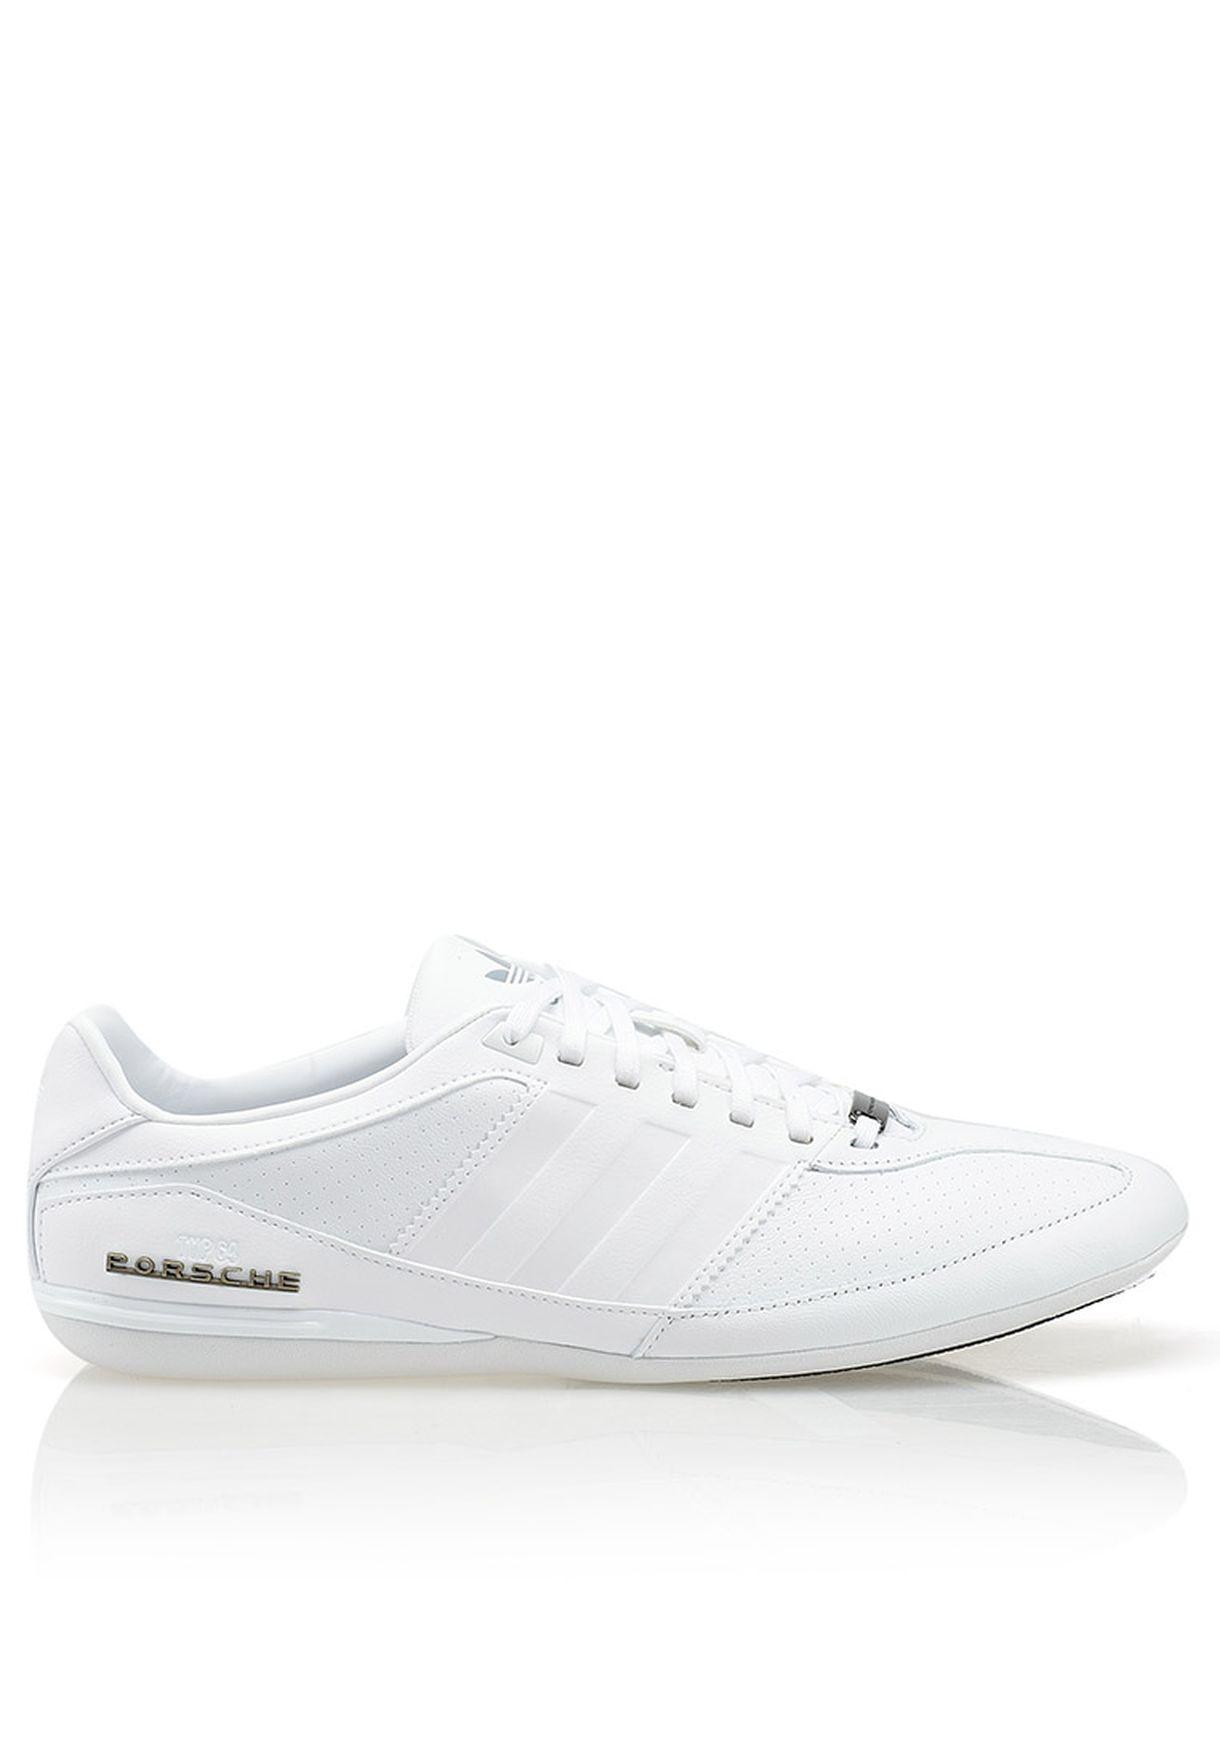 promo code 35147 99909 ... Shop adidas Originals white Porsche Typ 64 Q23135 for Men in UAE .